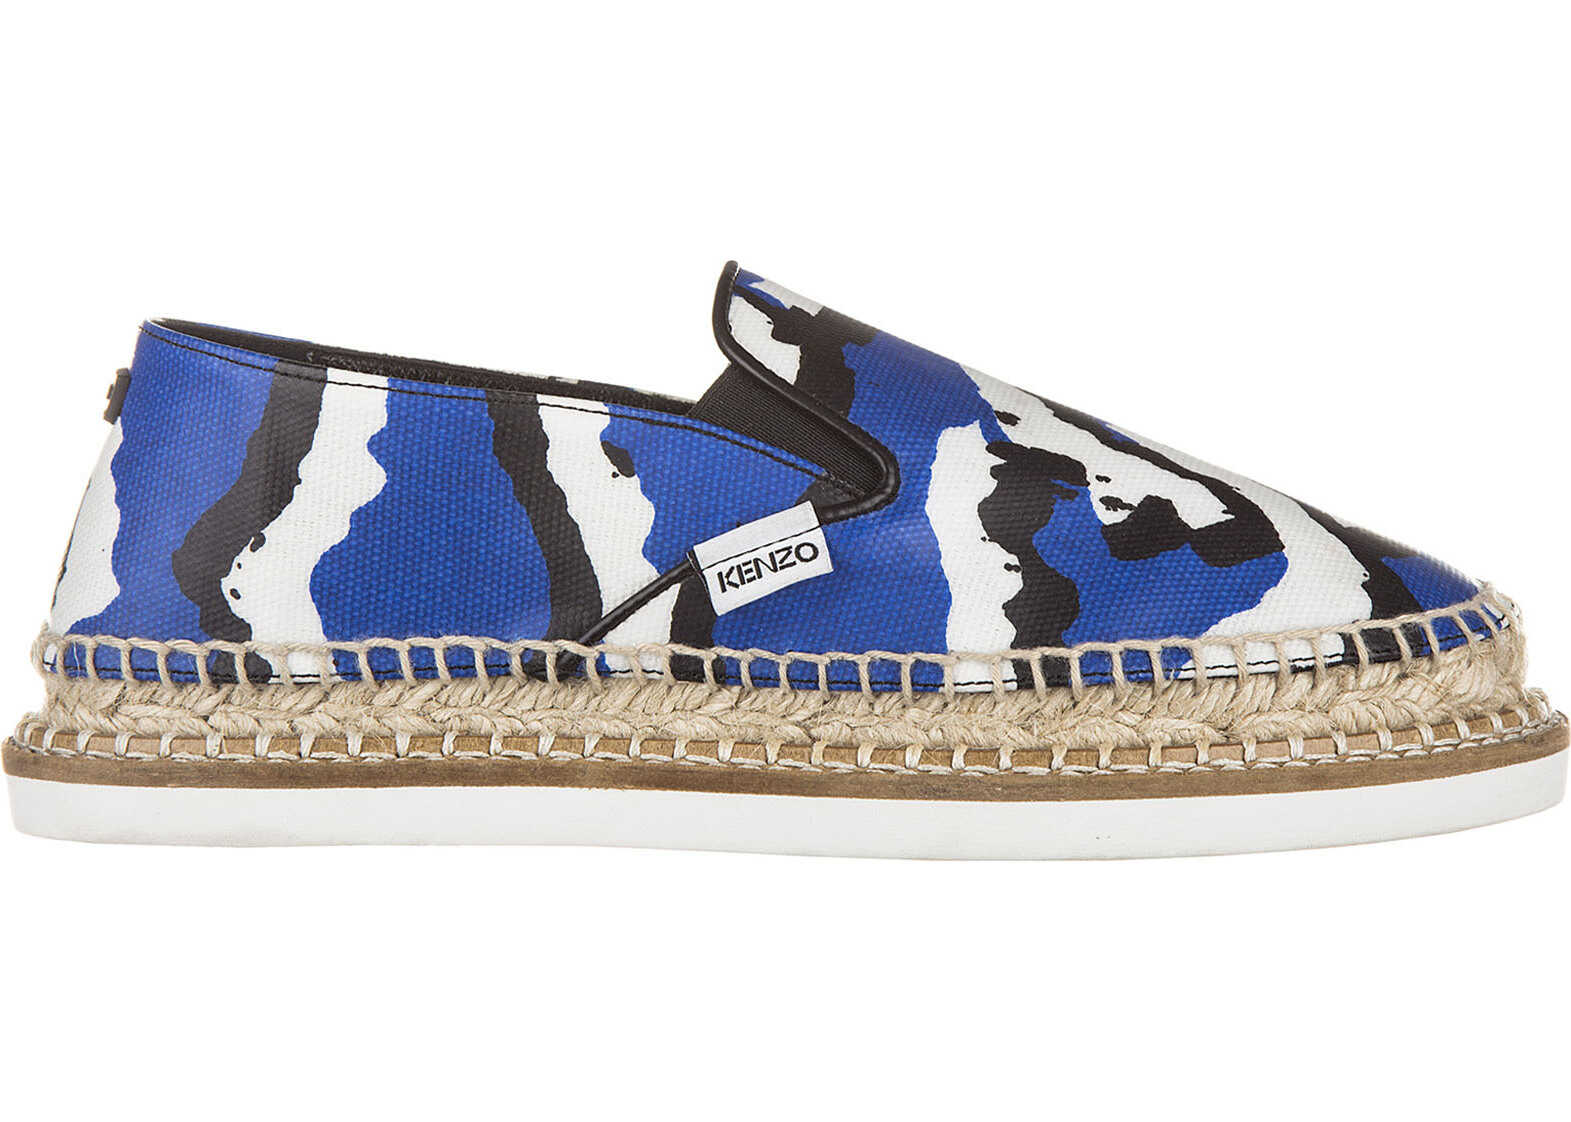 Kenzo On Shoes Blue